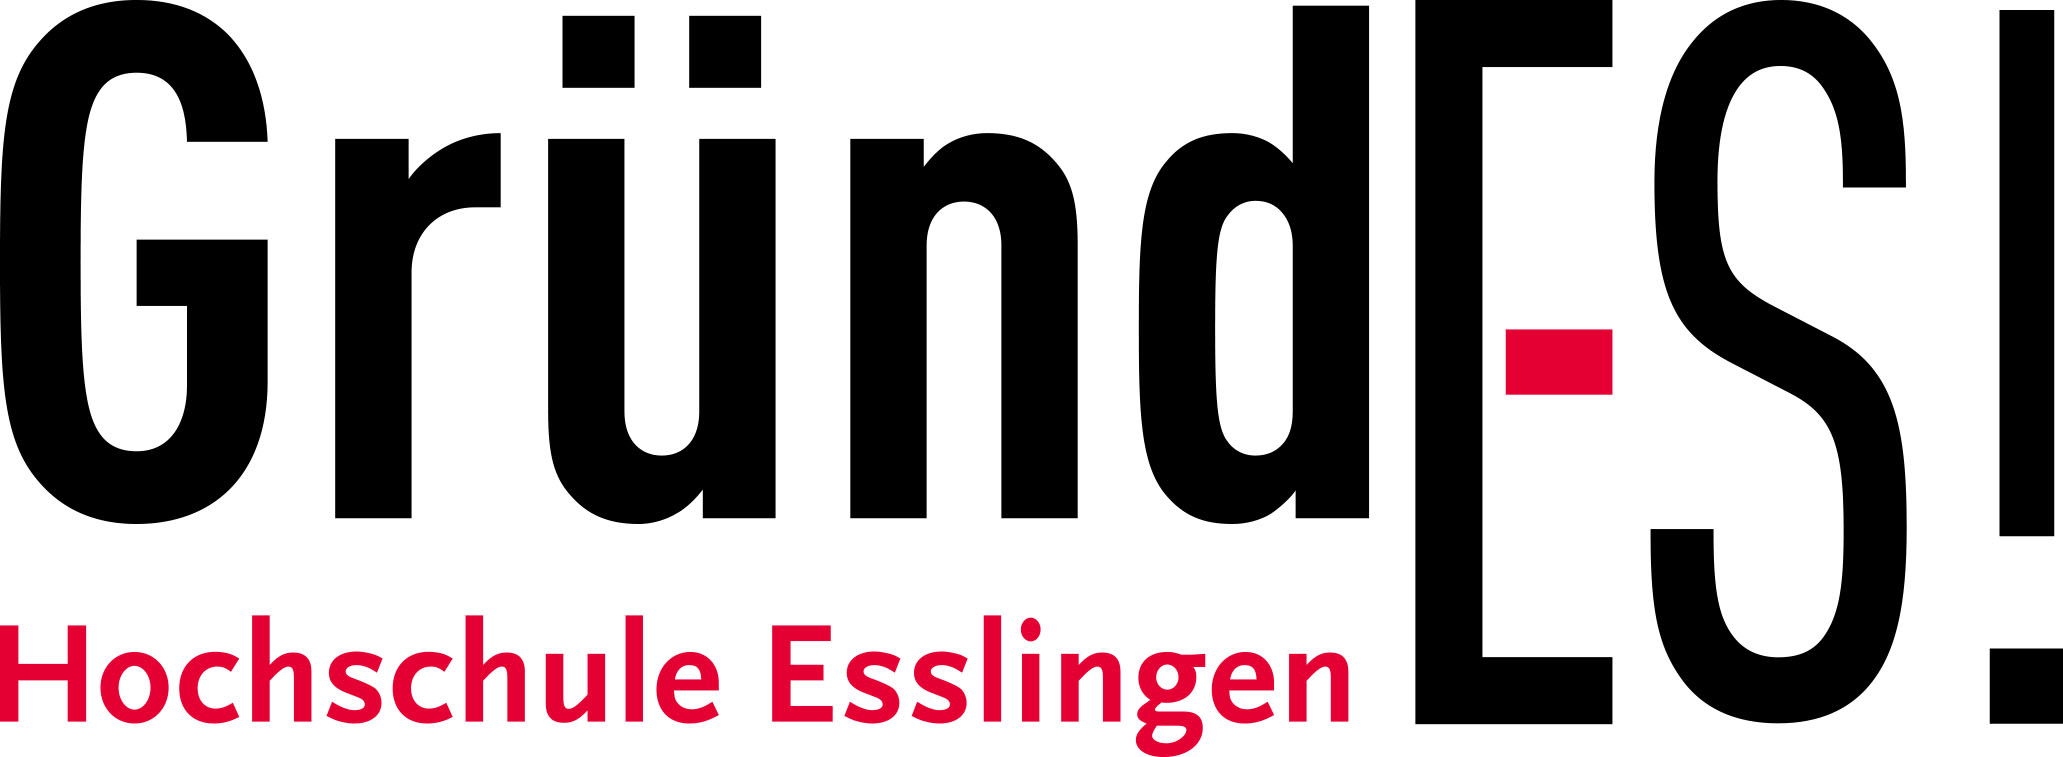 Community Partner de:hub, Logo Hochschule Esslingen